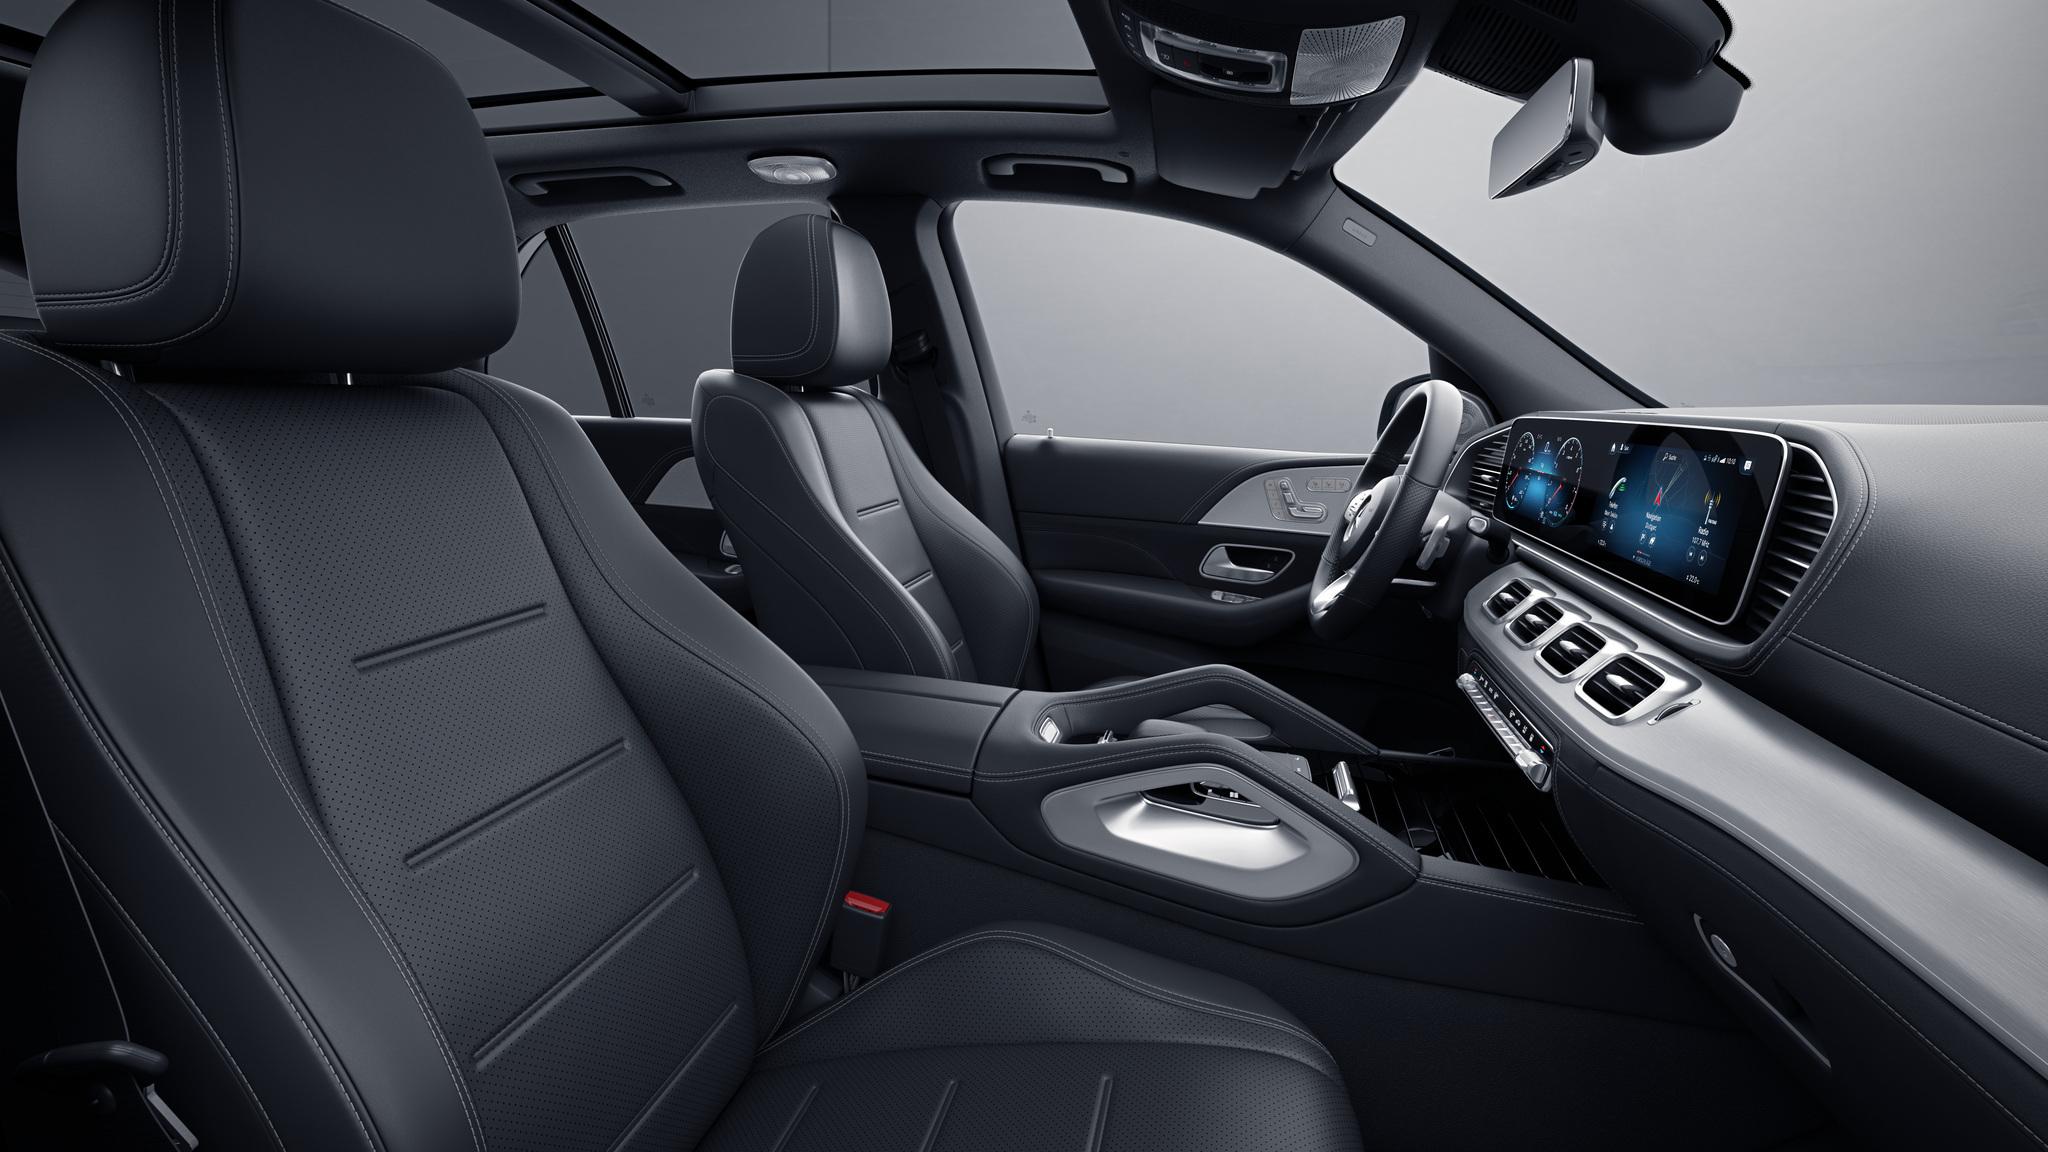 Habitacle de la Mercedes GLE -  Sellerie  Cuir Nappa cuir noir